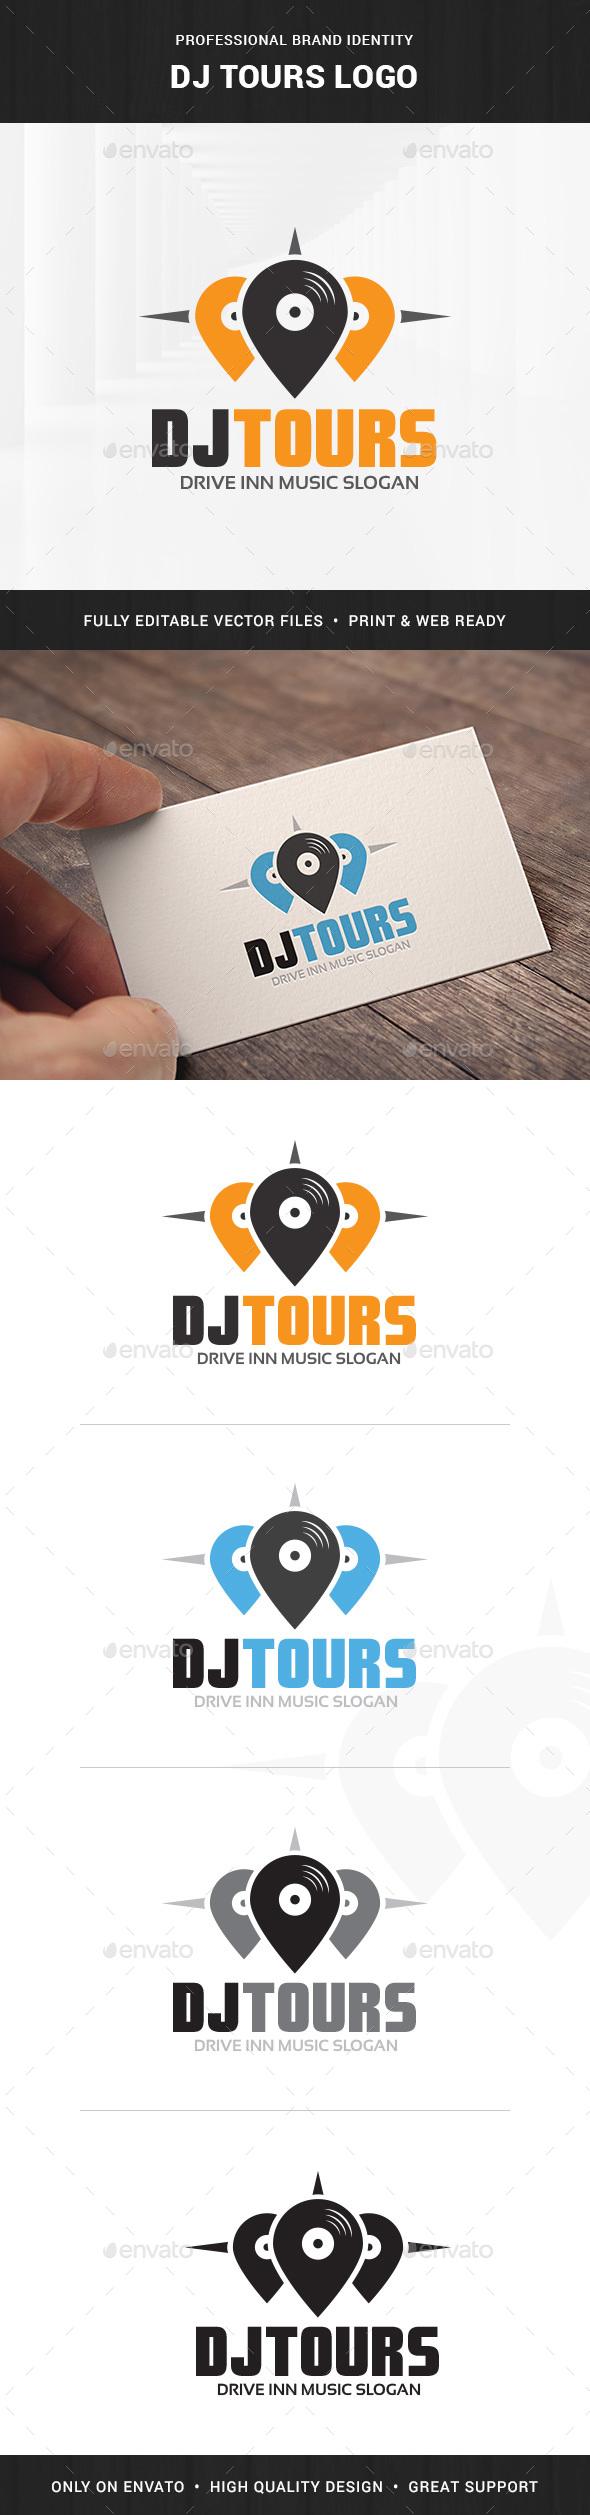 Logo Dj Graphics, Designs & Templates from GraphicRiver